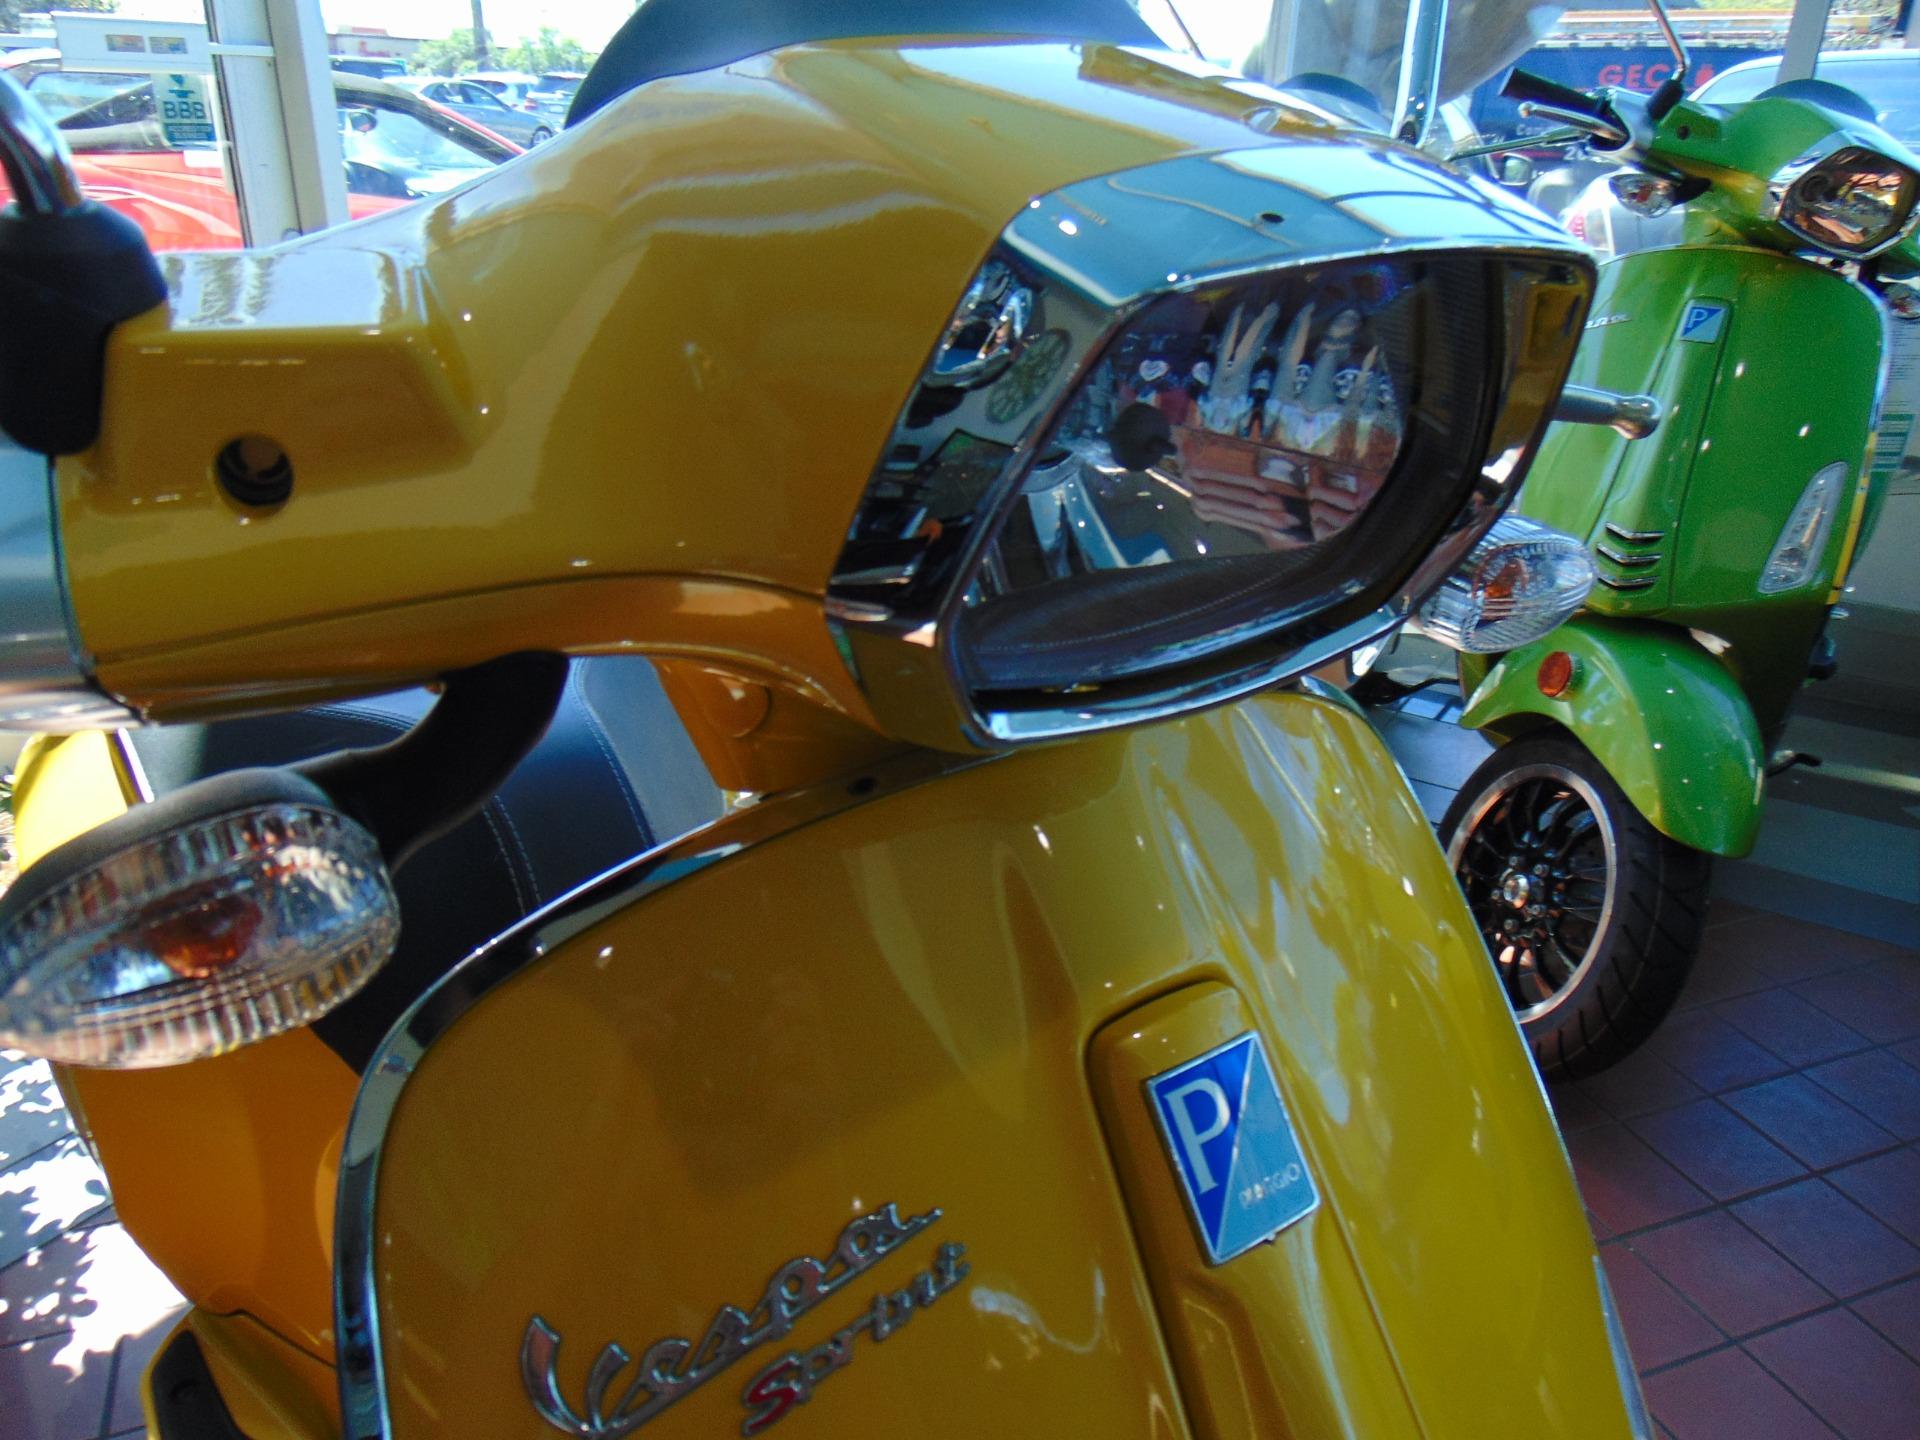 New-2016-Vespa-Sprint-150